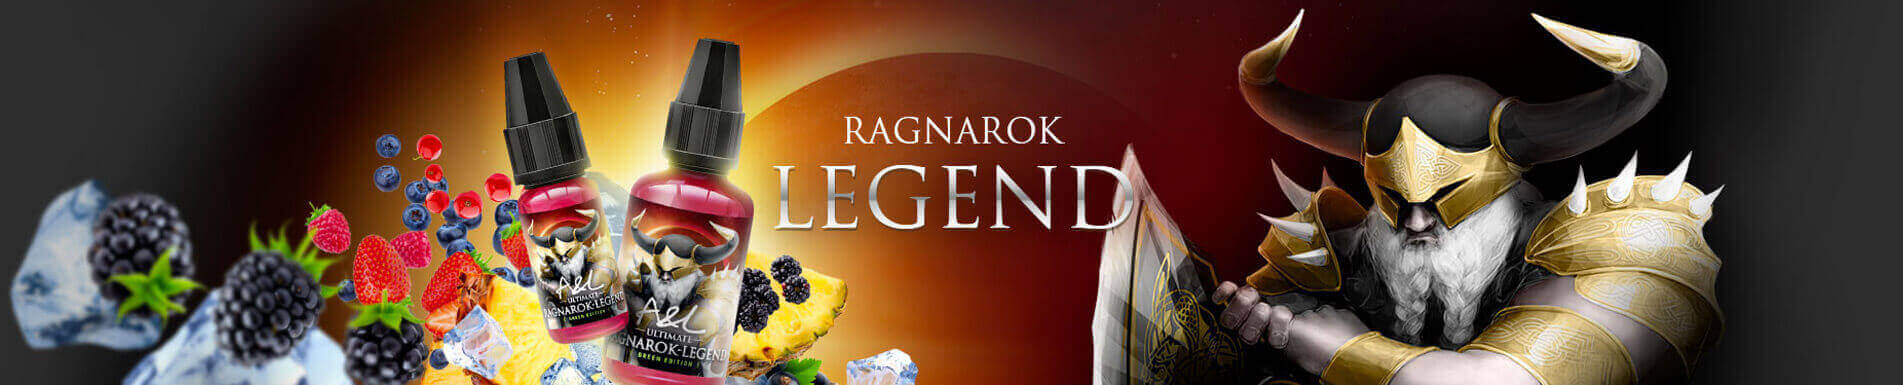 Arôme Ragnarok Legend par A&L 30 mL